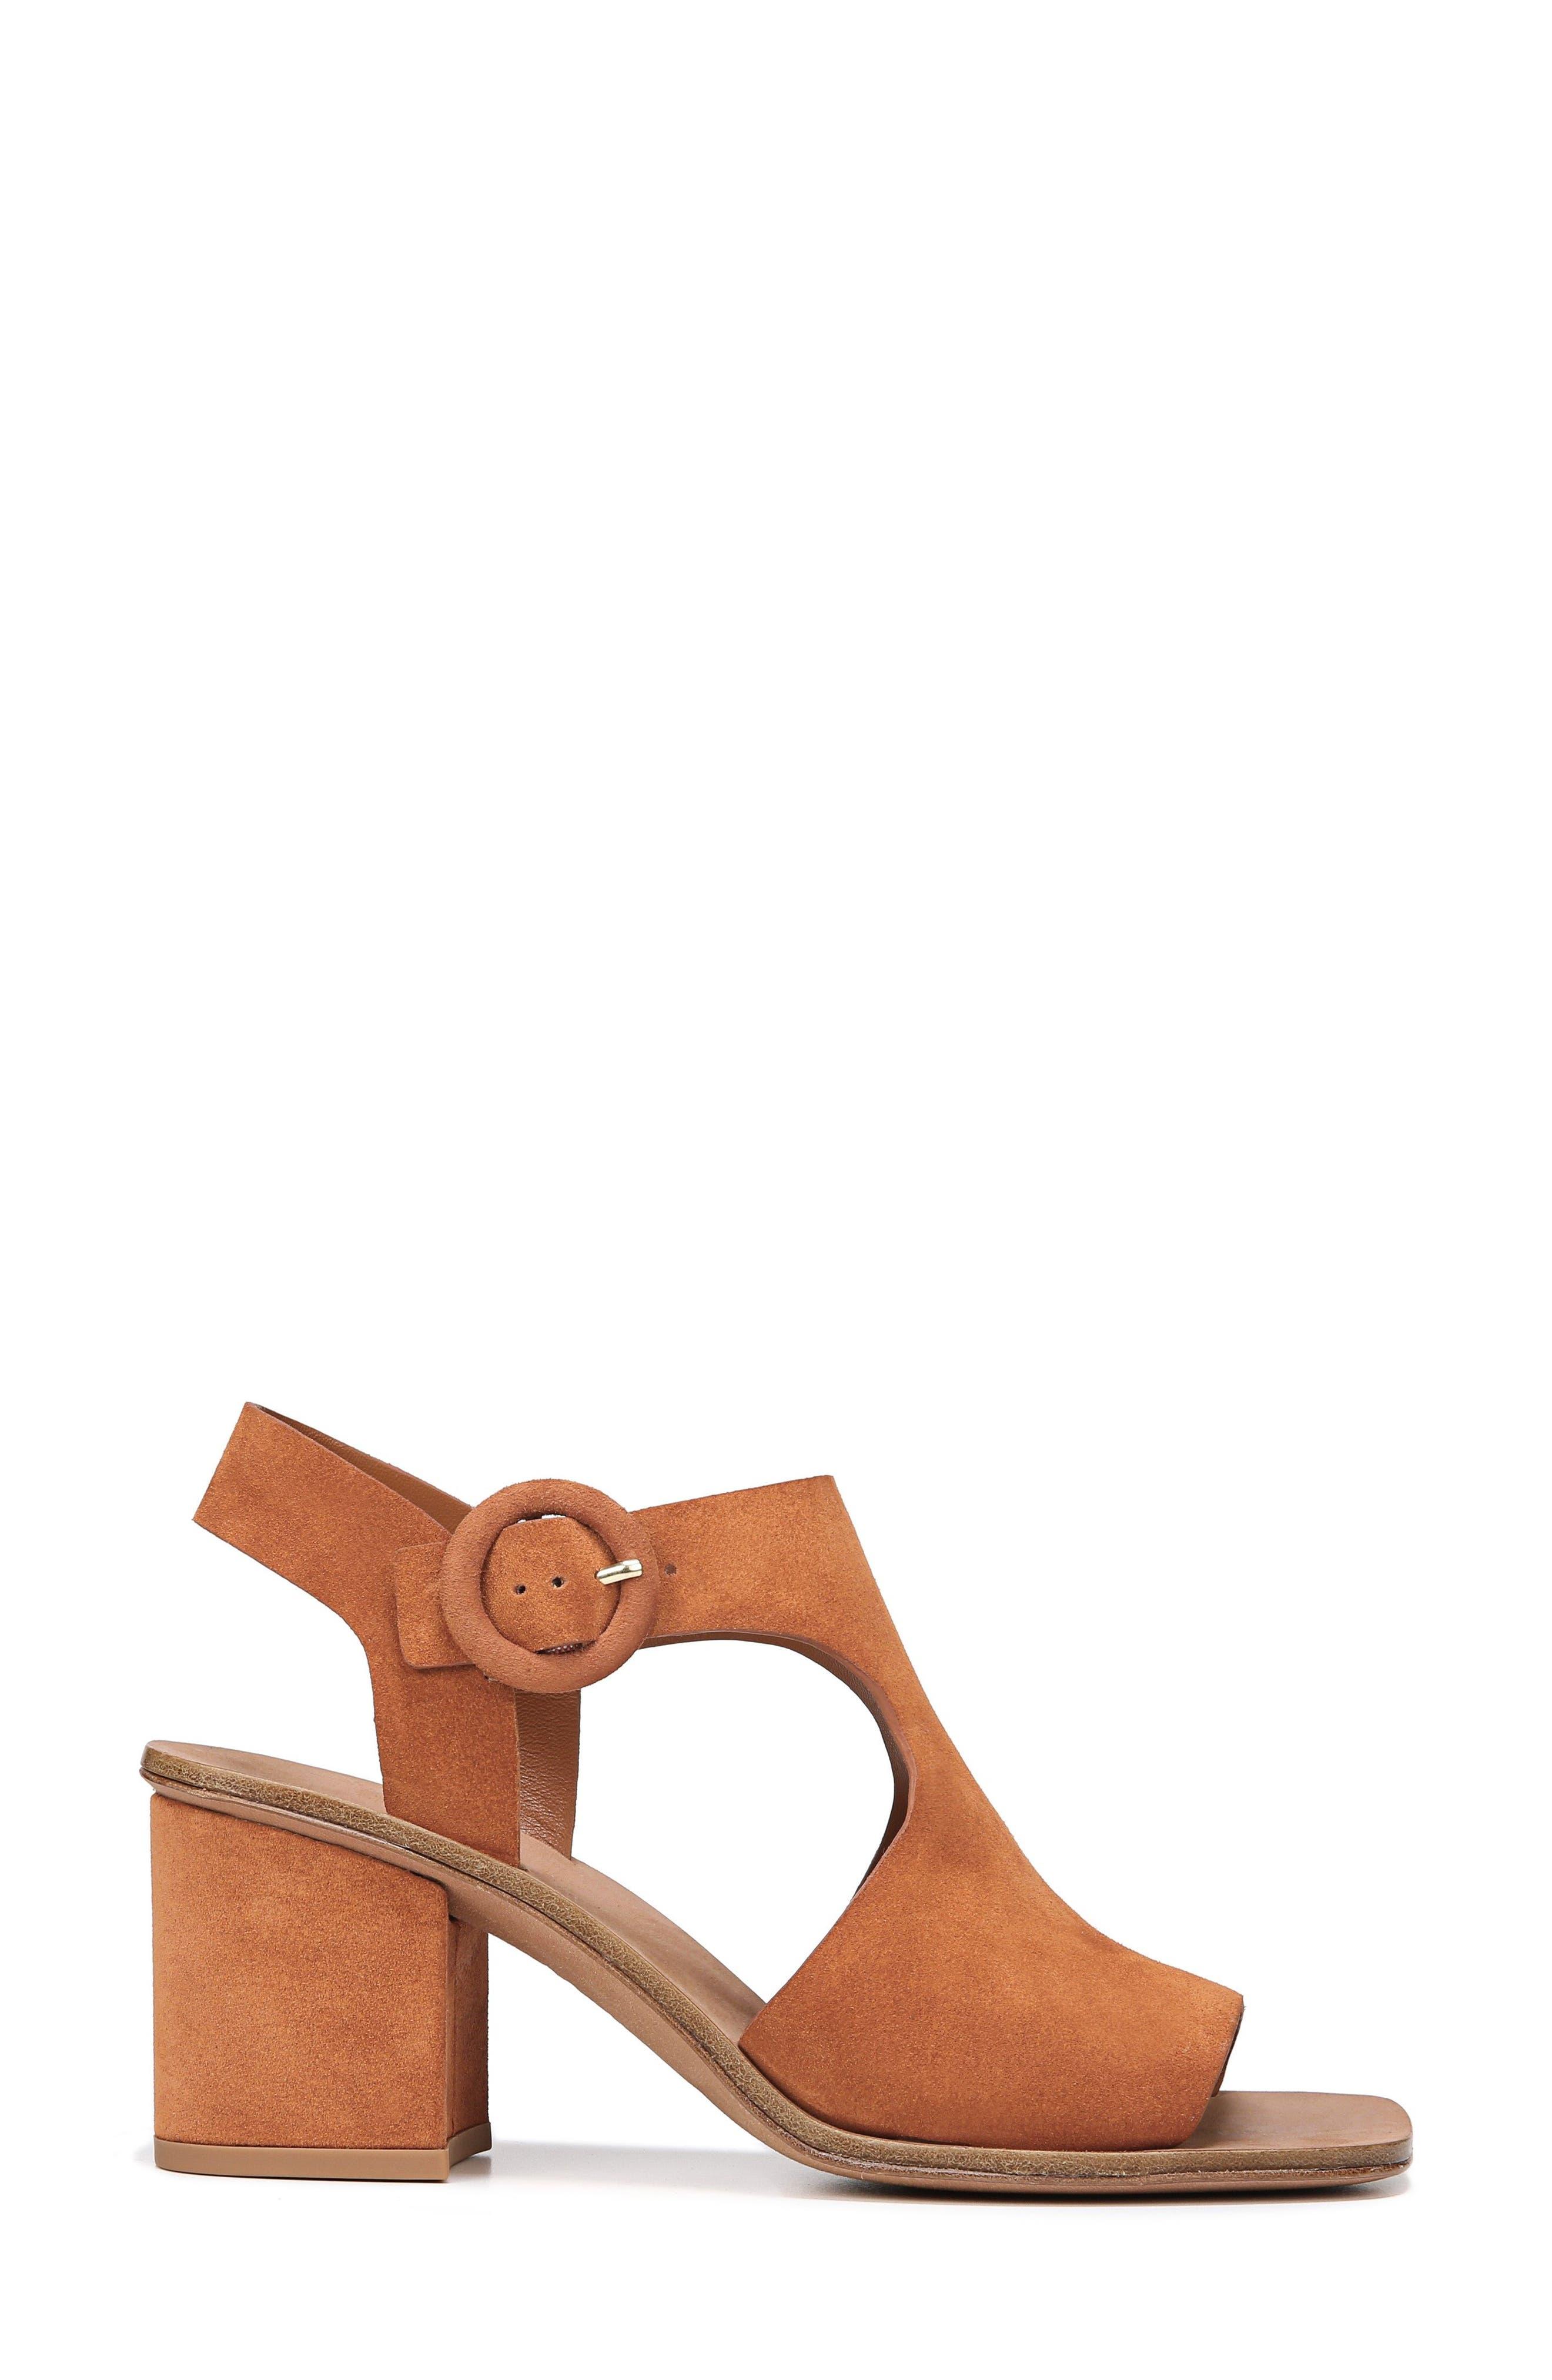 Katya Shield Sandal,                             Alternate thumbnail 3, color,                             Amber Suede